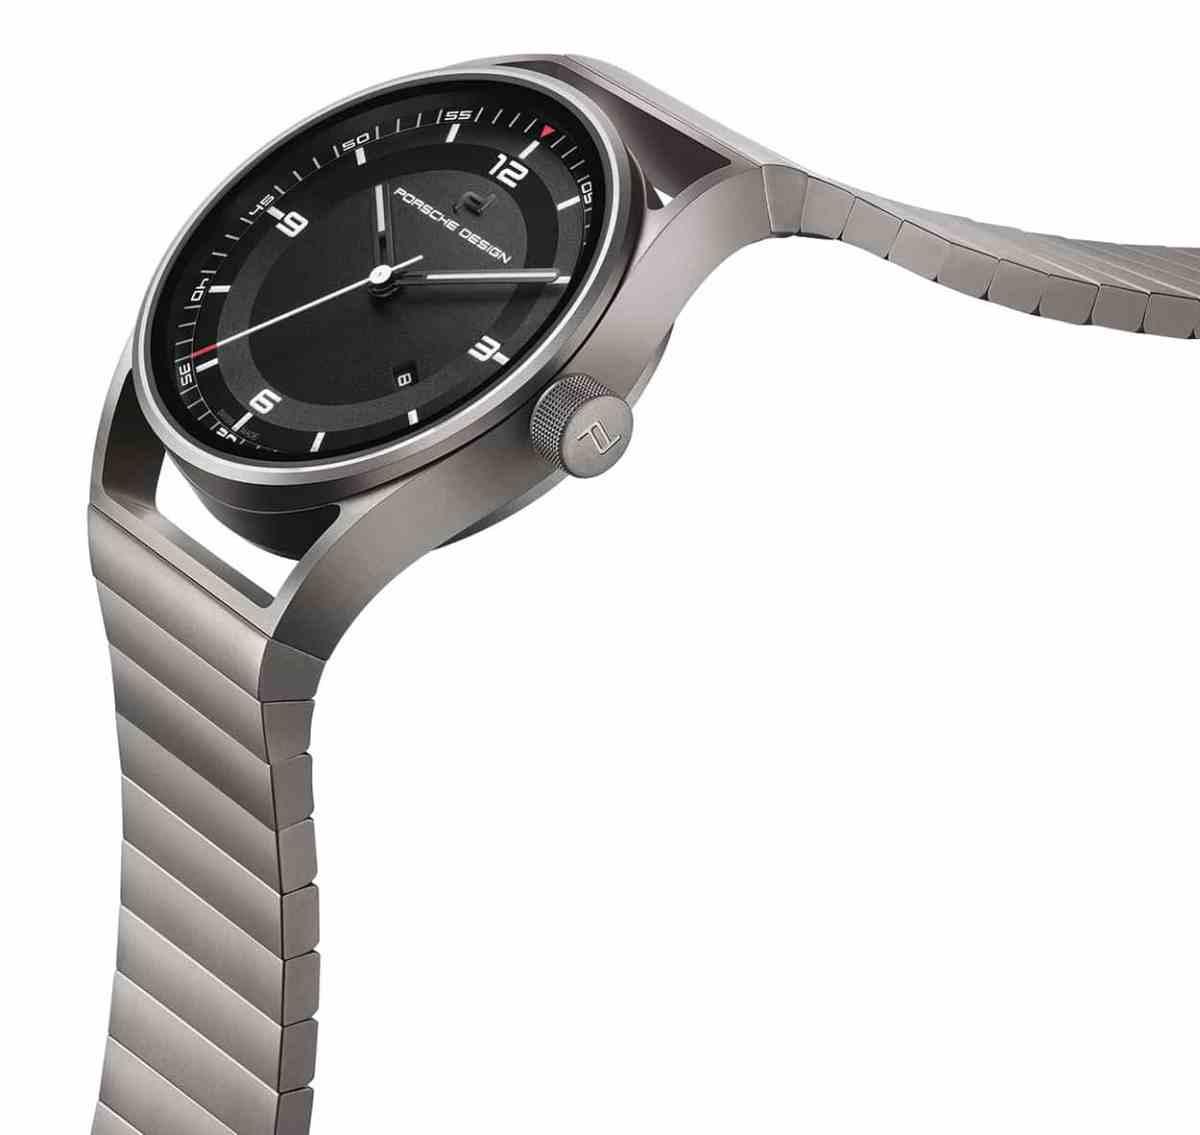 4046901418168_1919-Datetimer-Series-1-All-Titanium_Seite